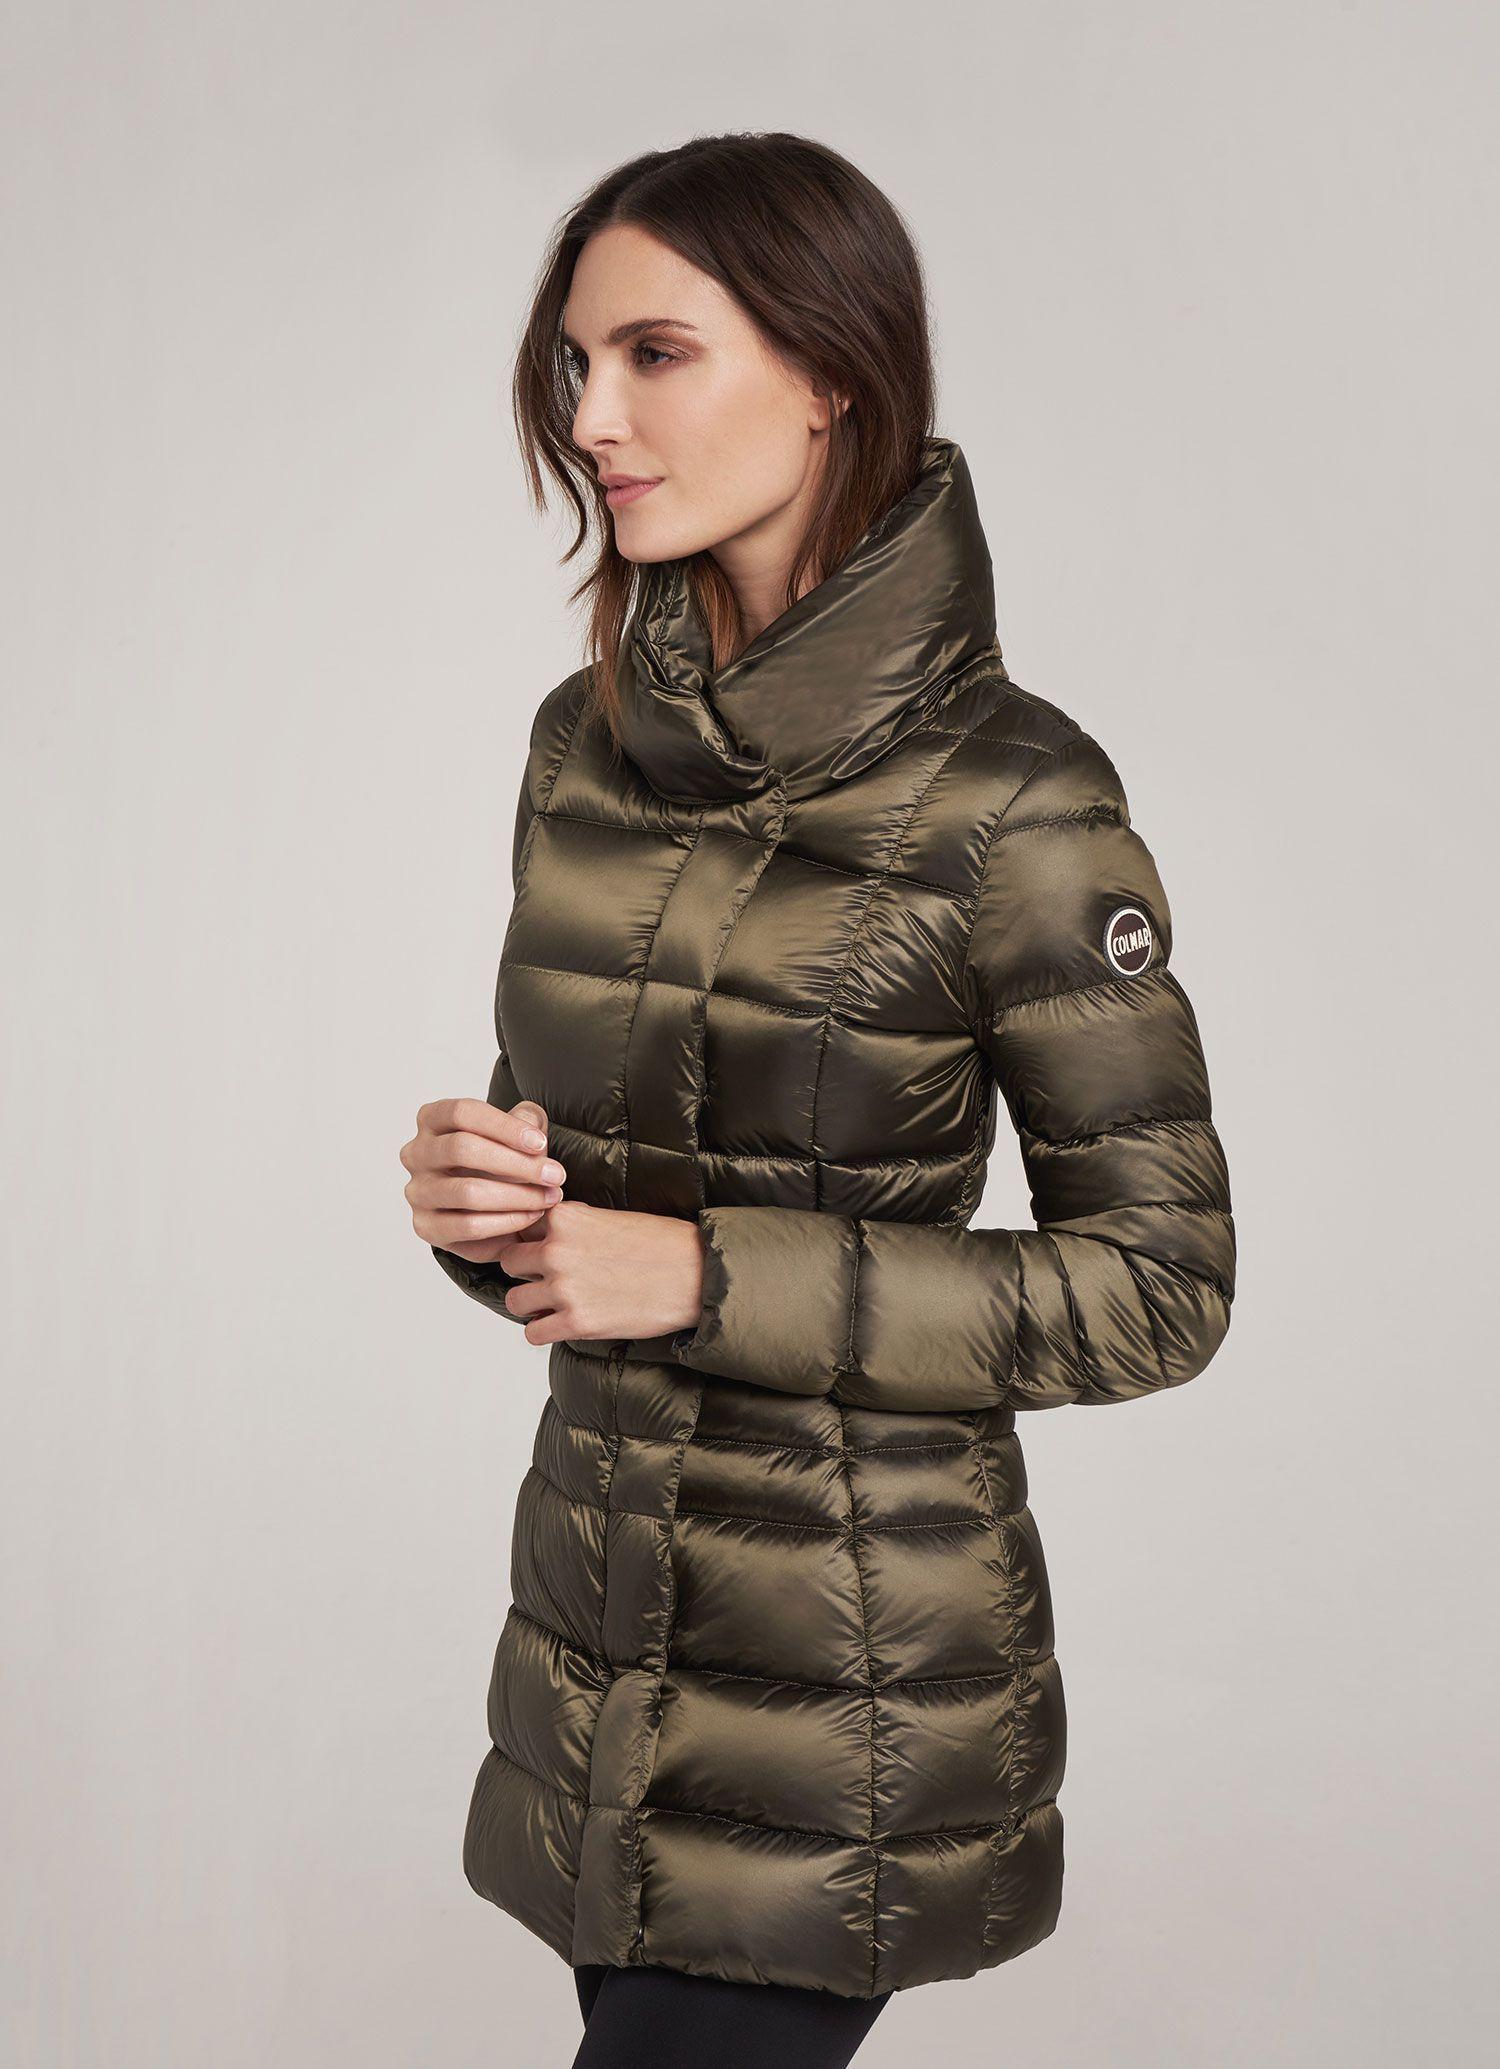 d590a1457a Colmar Originals women's glossy down jacket with maxi collar ...